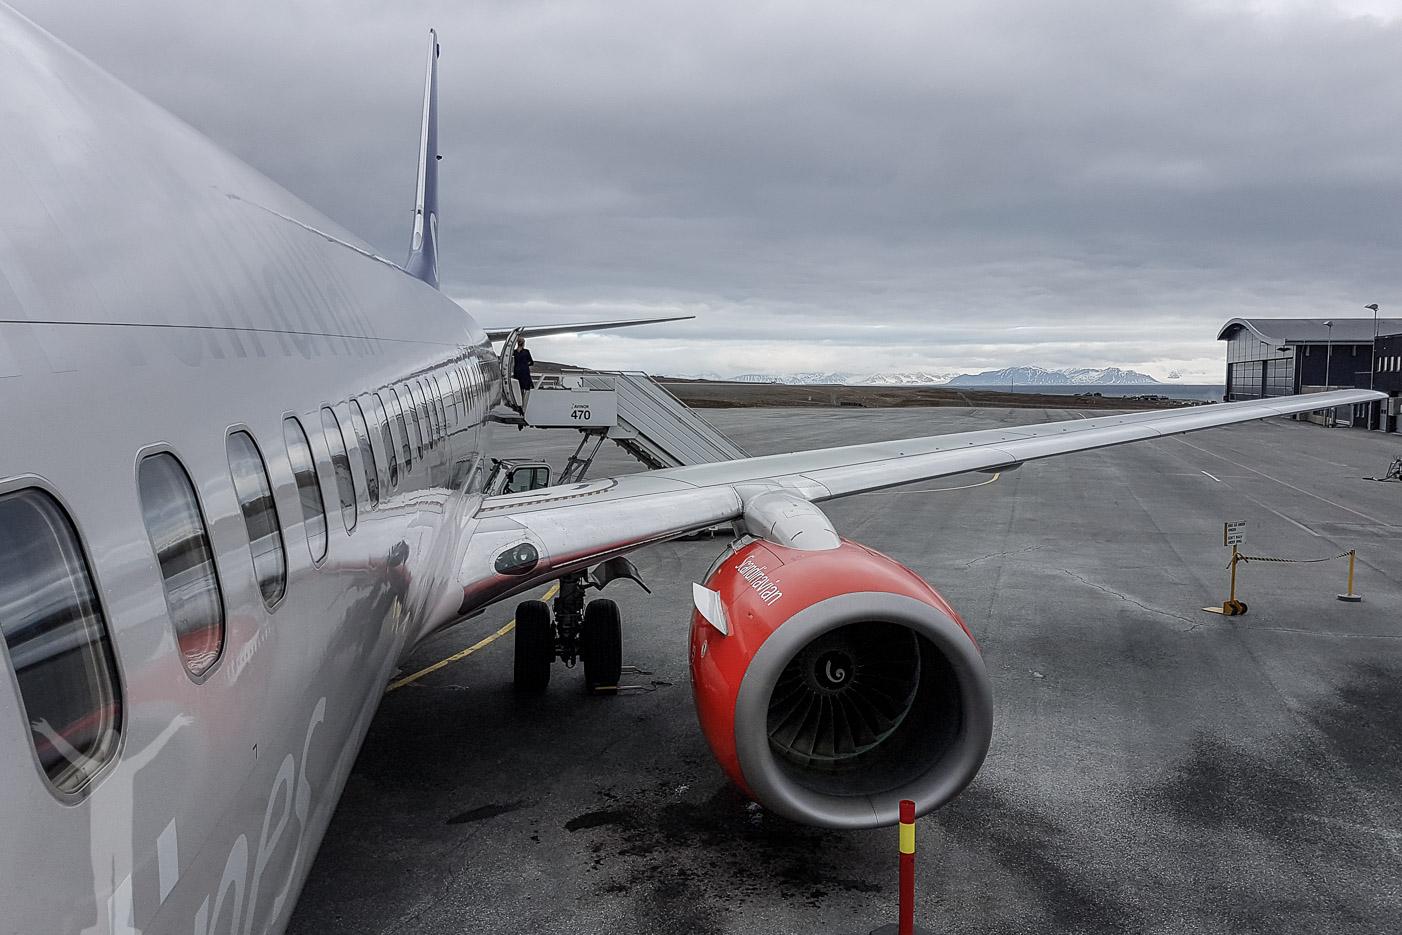 Svalbard Airport, LYR